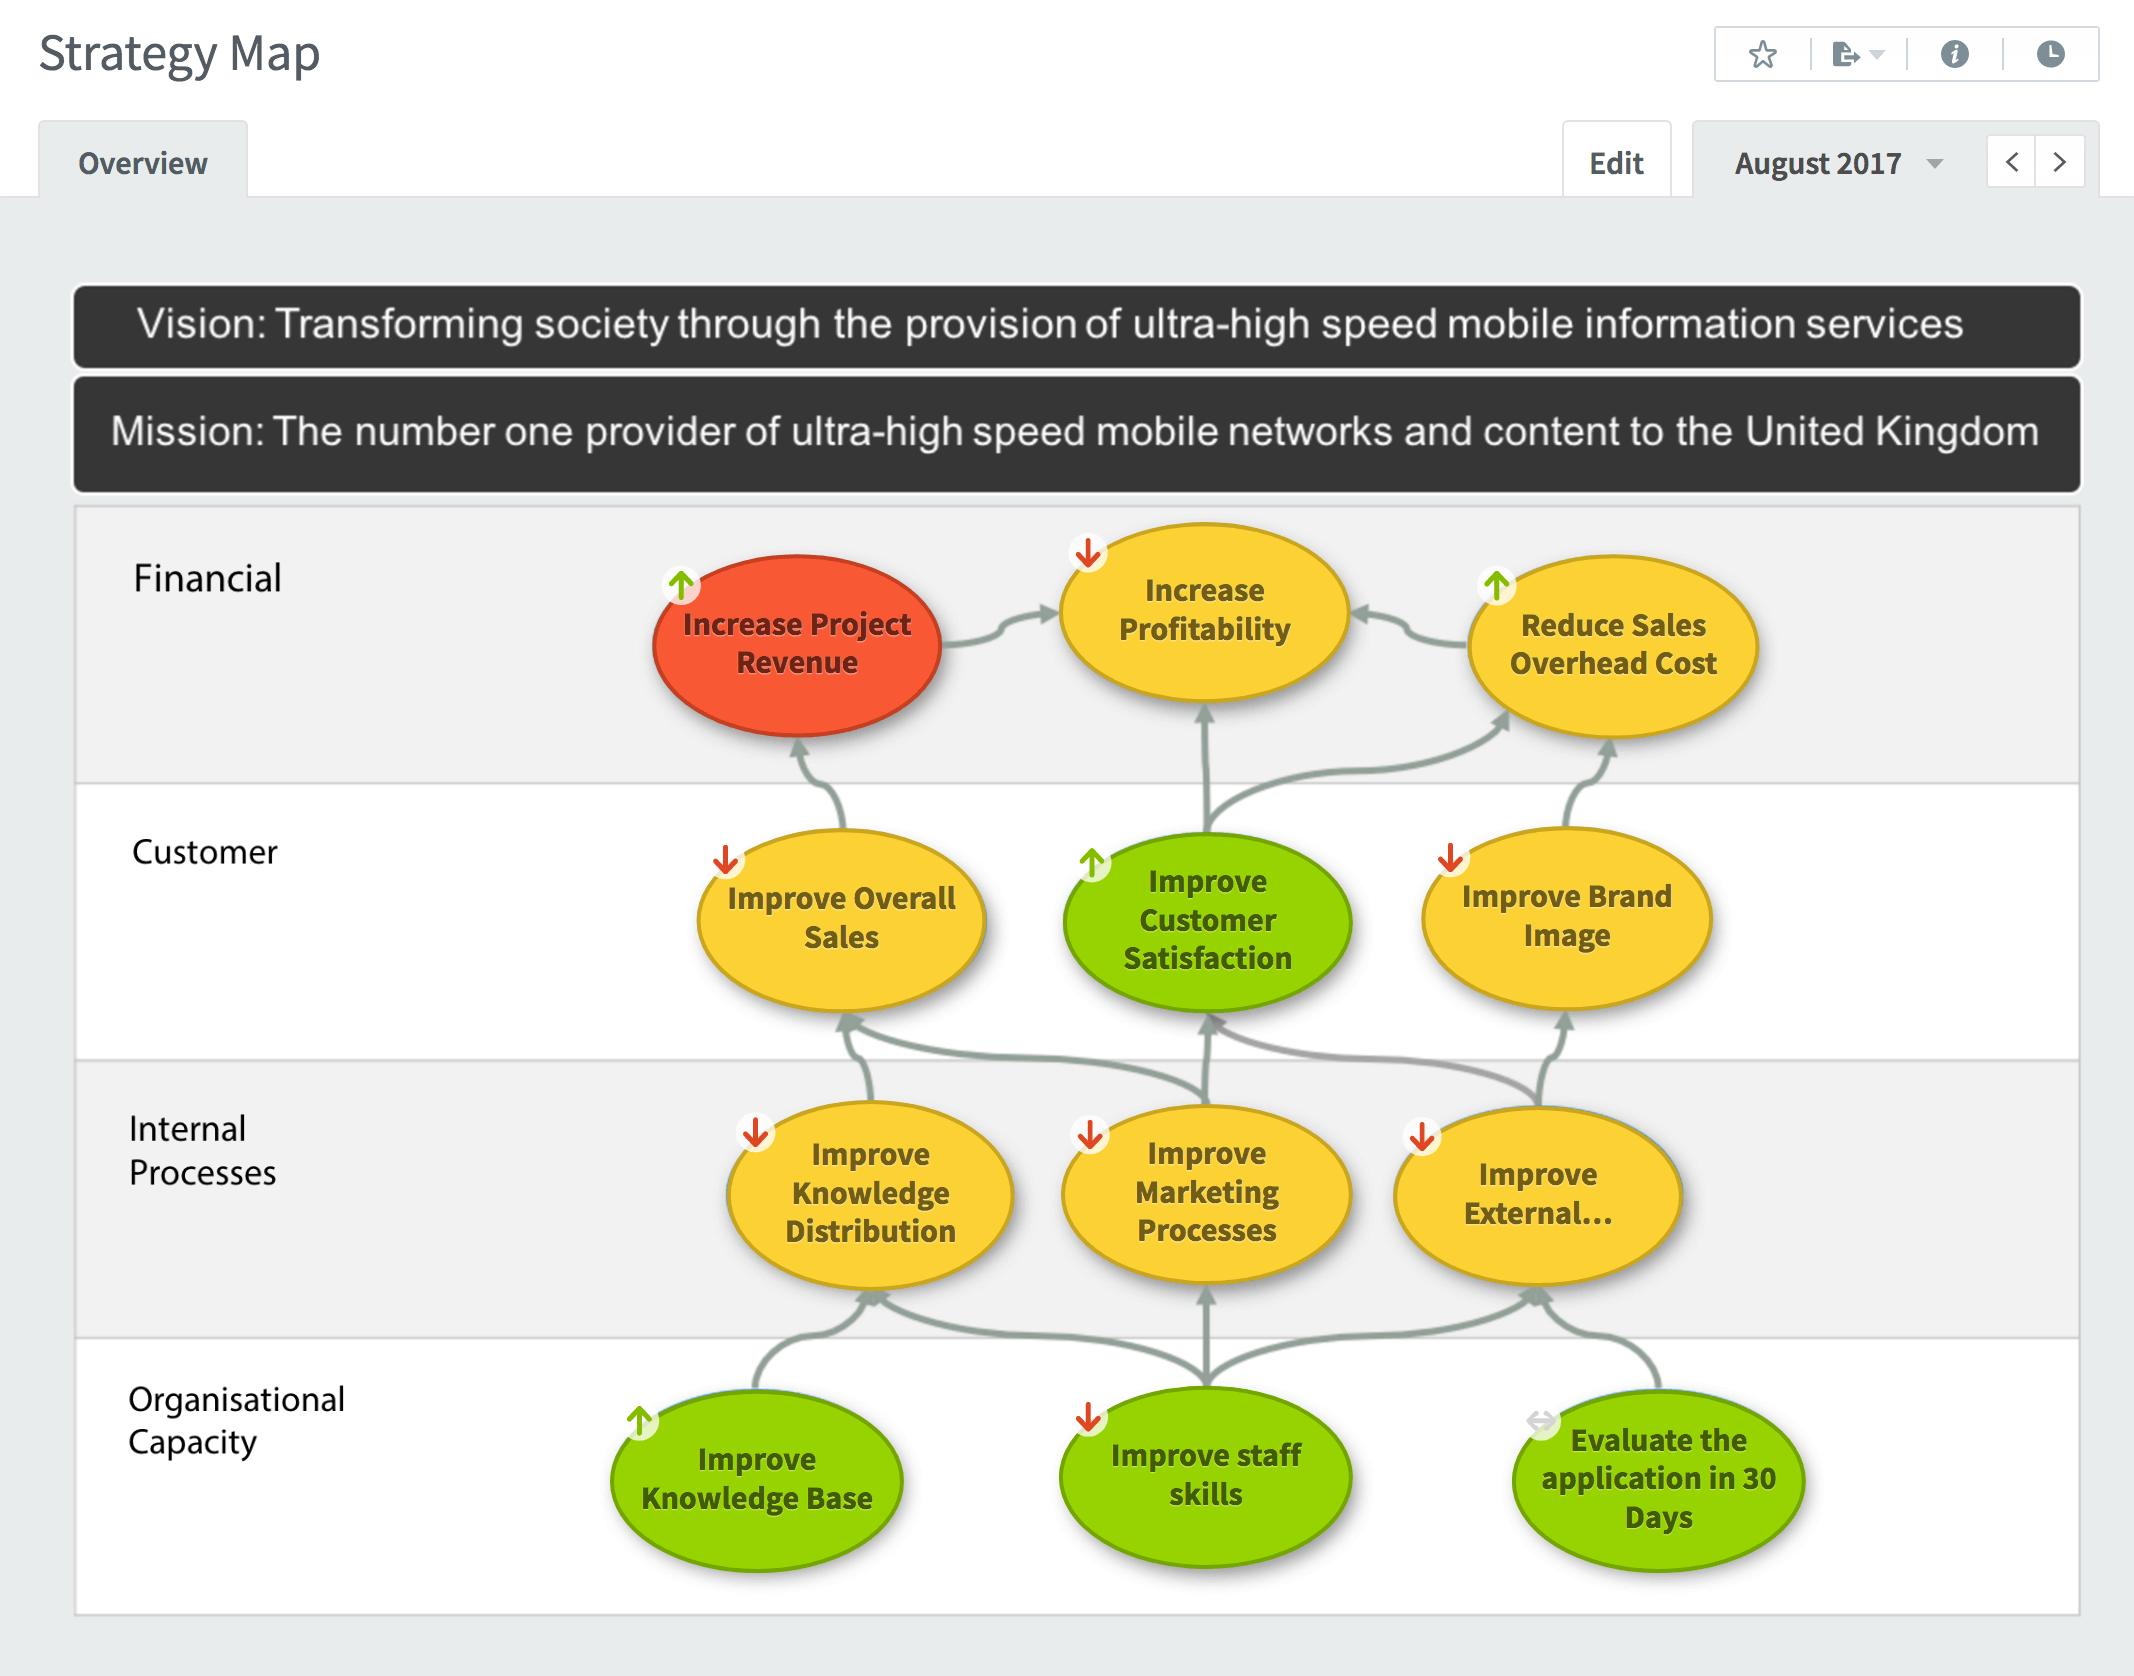 KPI Dashboard - Strategy Map